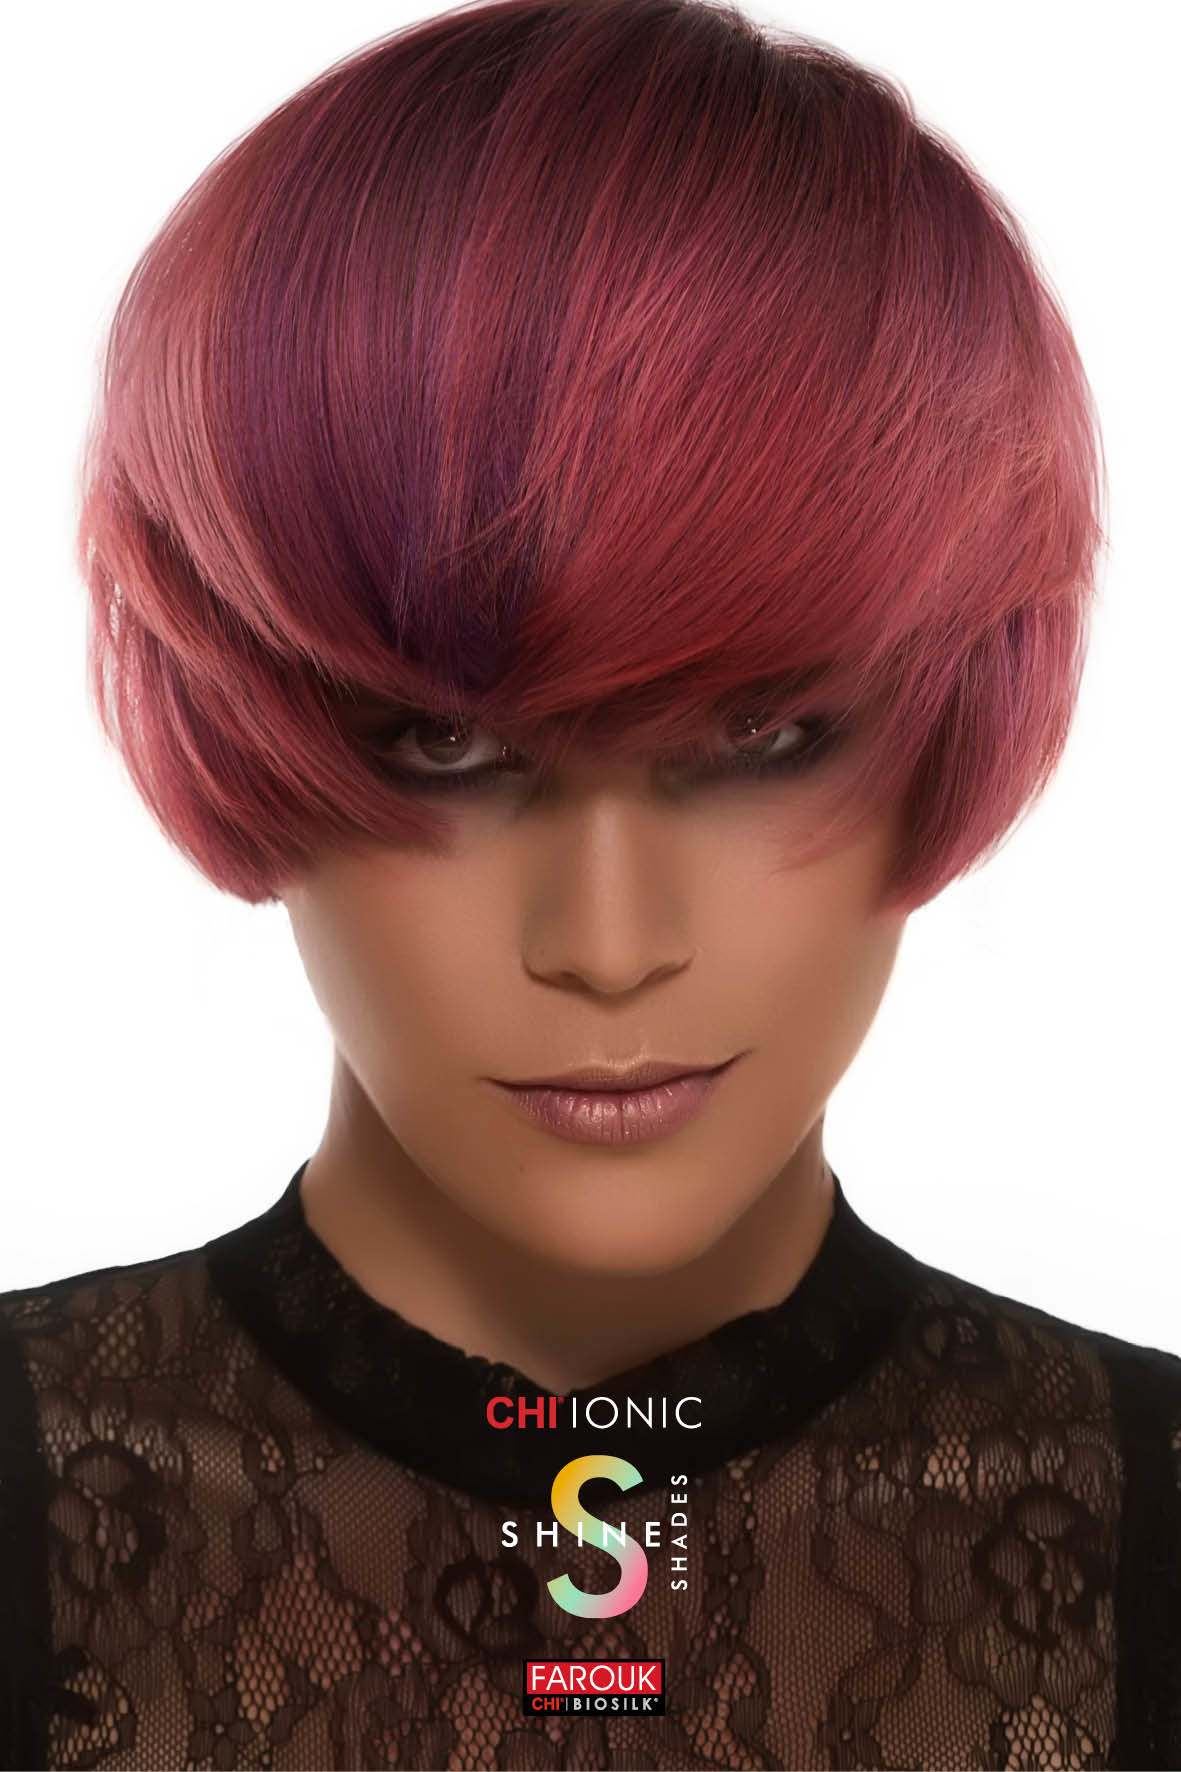 Nieuwe kleurrevolutie: CHI Ionic Shine Shades